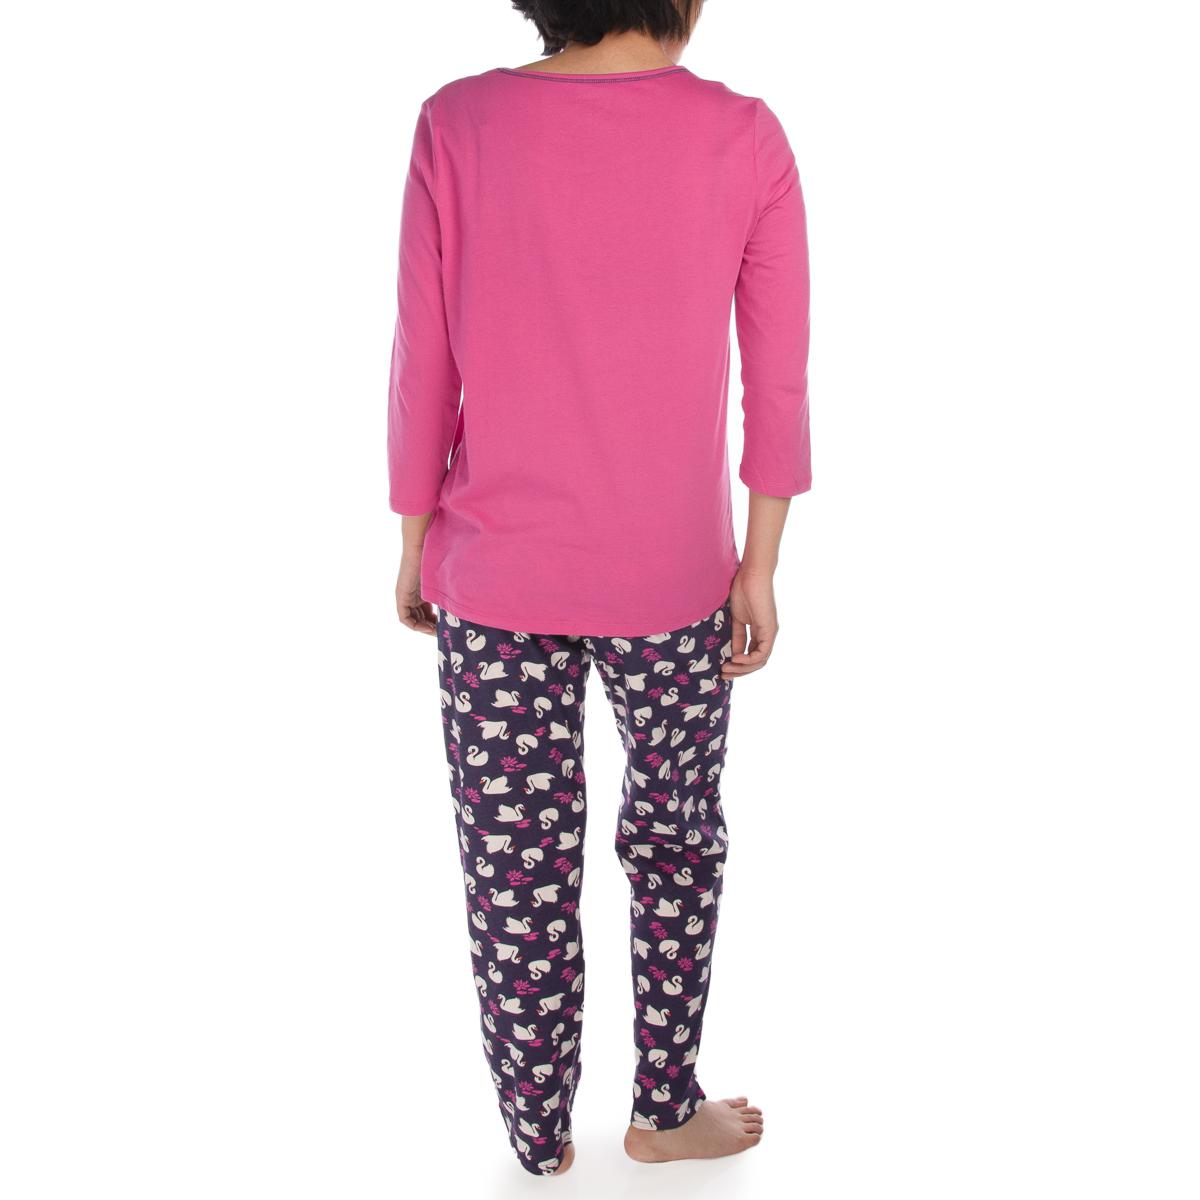 2-Piece-Jockey-Soft-Cotton-Pajamas-For-Women-Set-Top-Bottom-PJs-Sleepwear thumbnail 14